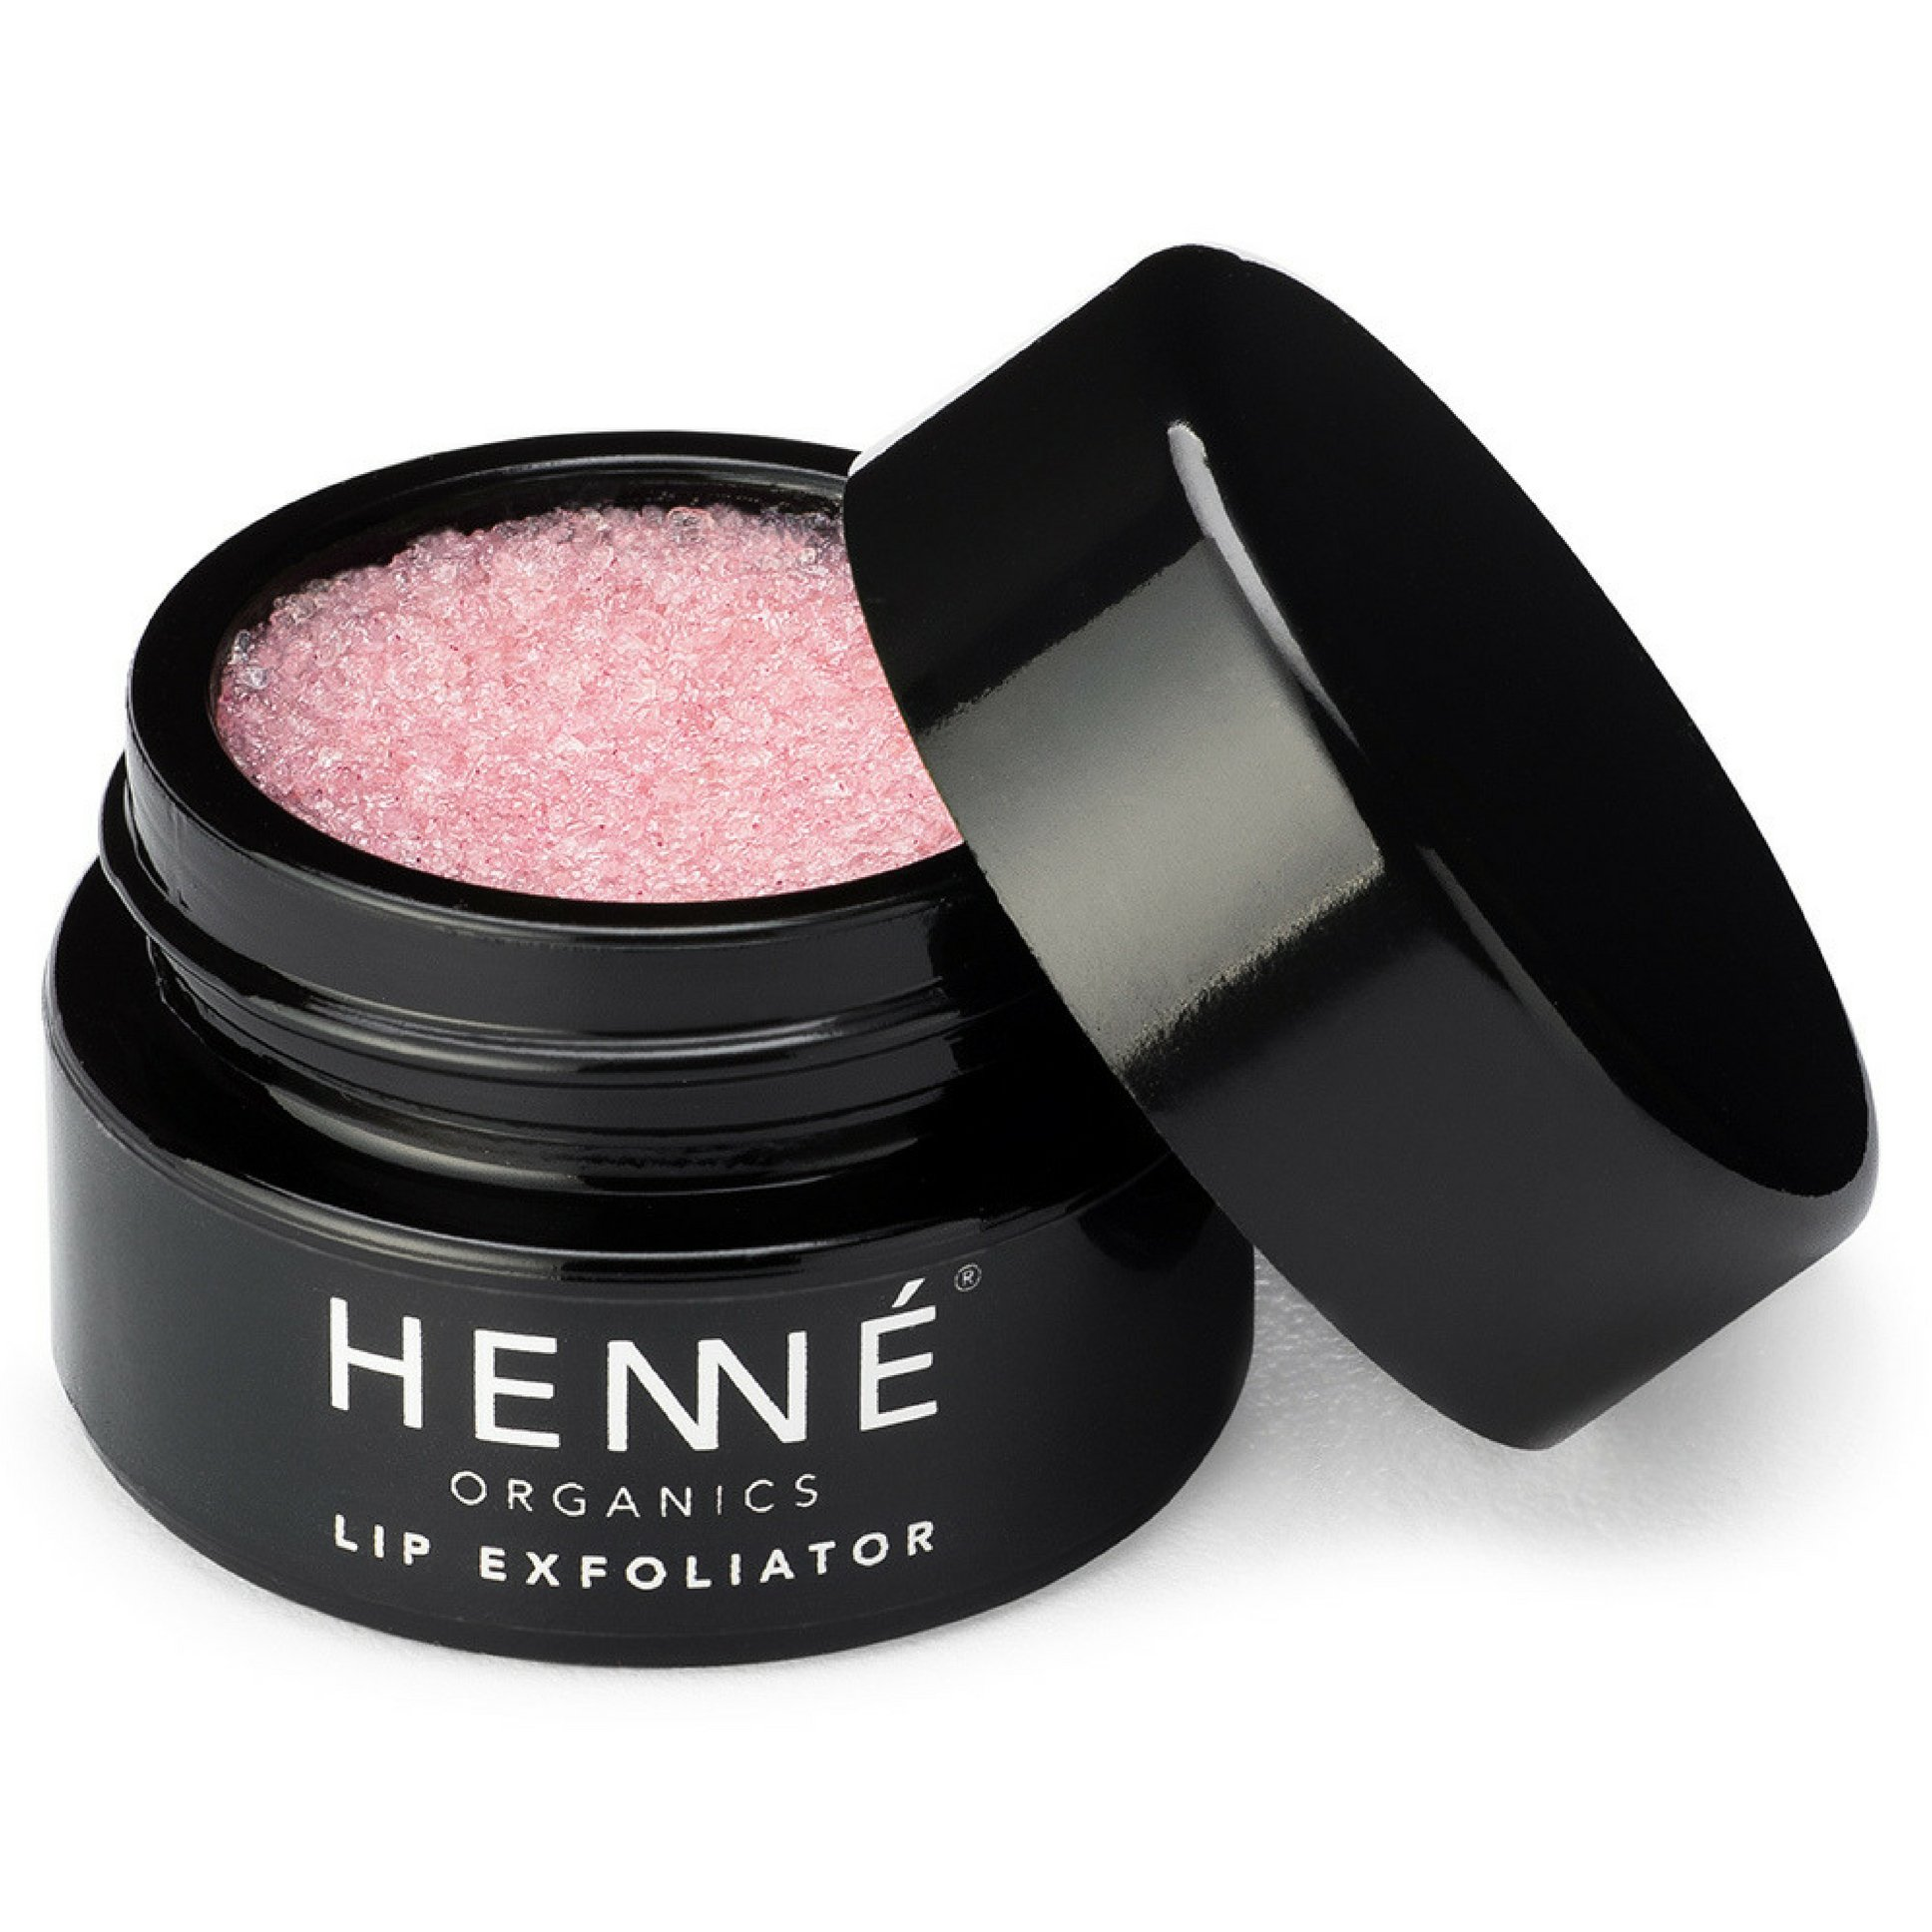 Henné Organics Lip Exfoliator - Natural and Organic Sugar Scrub - Rose Diamonds